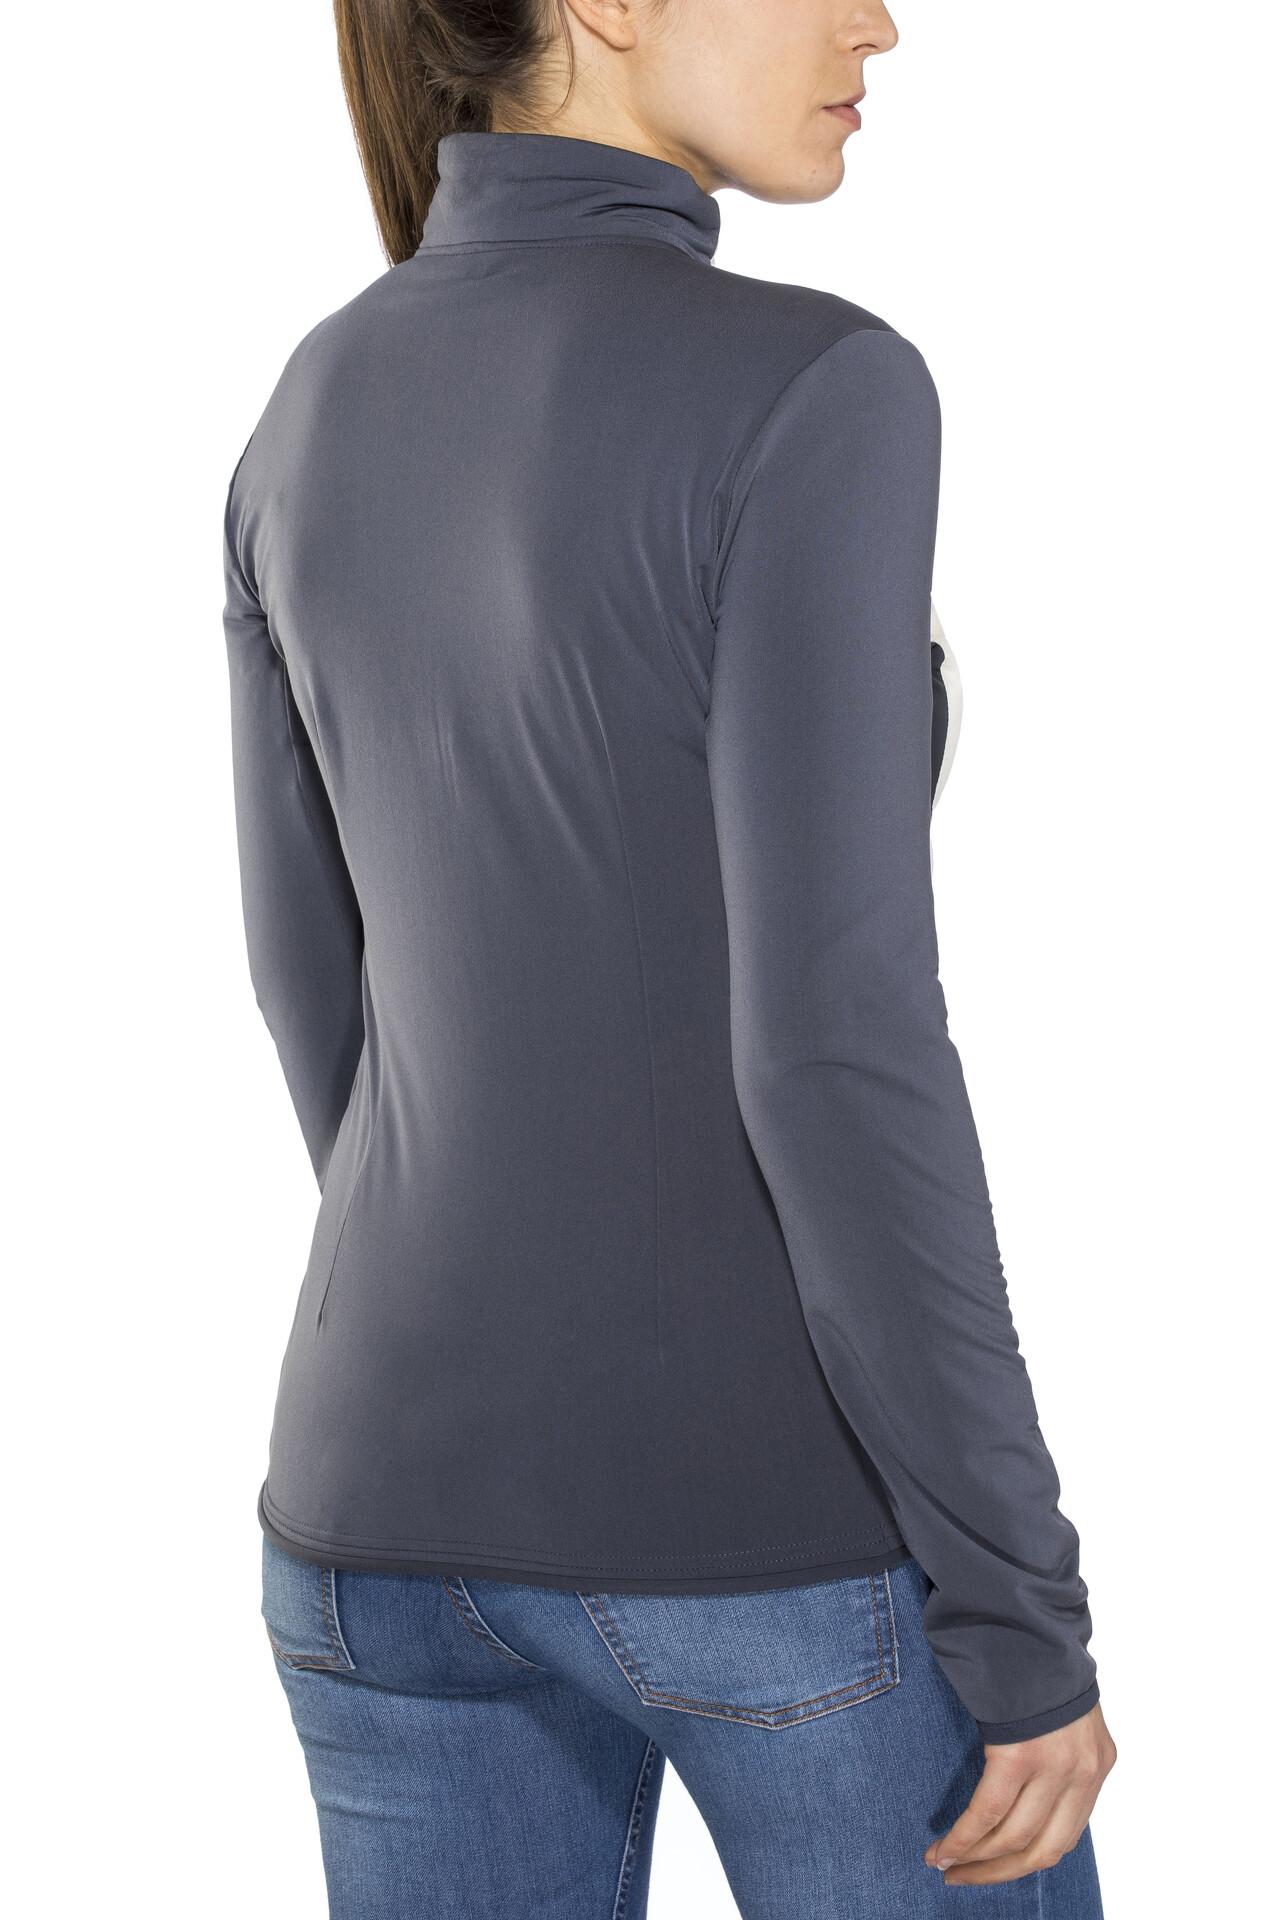 Meru Duntroon Hybrid Jacket Damen blue nightsmarshmallow